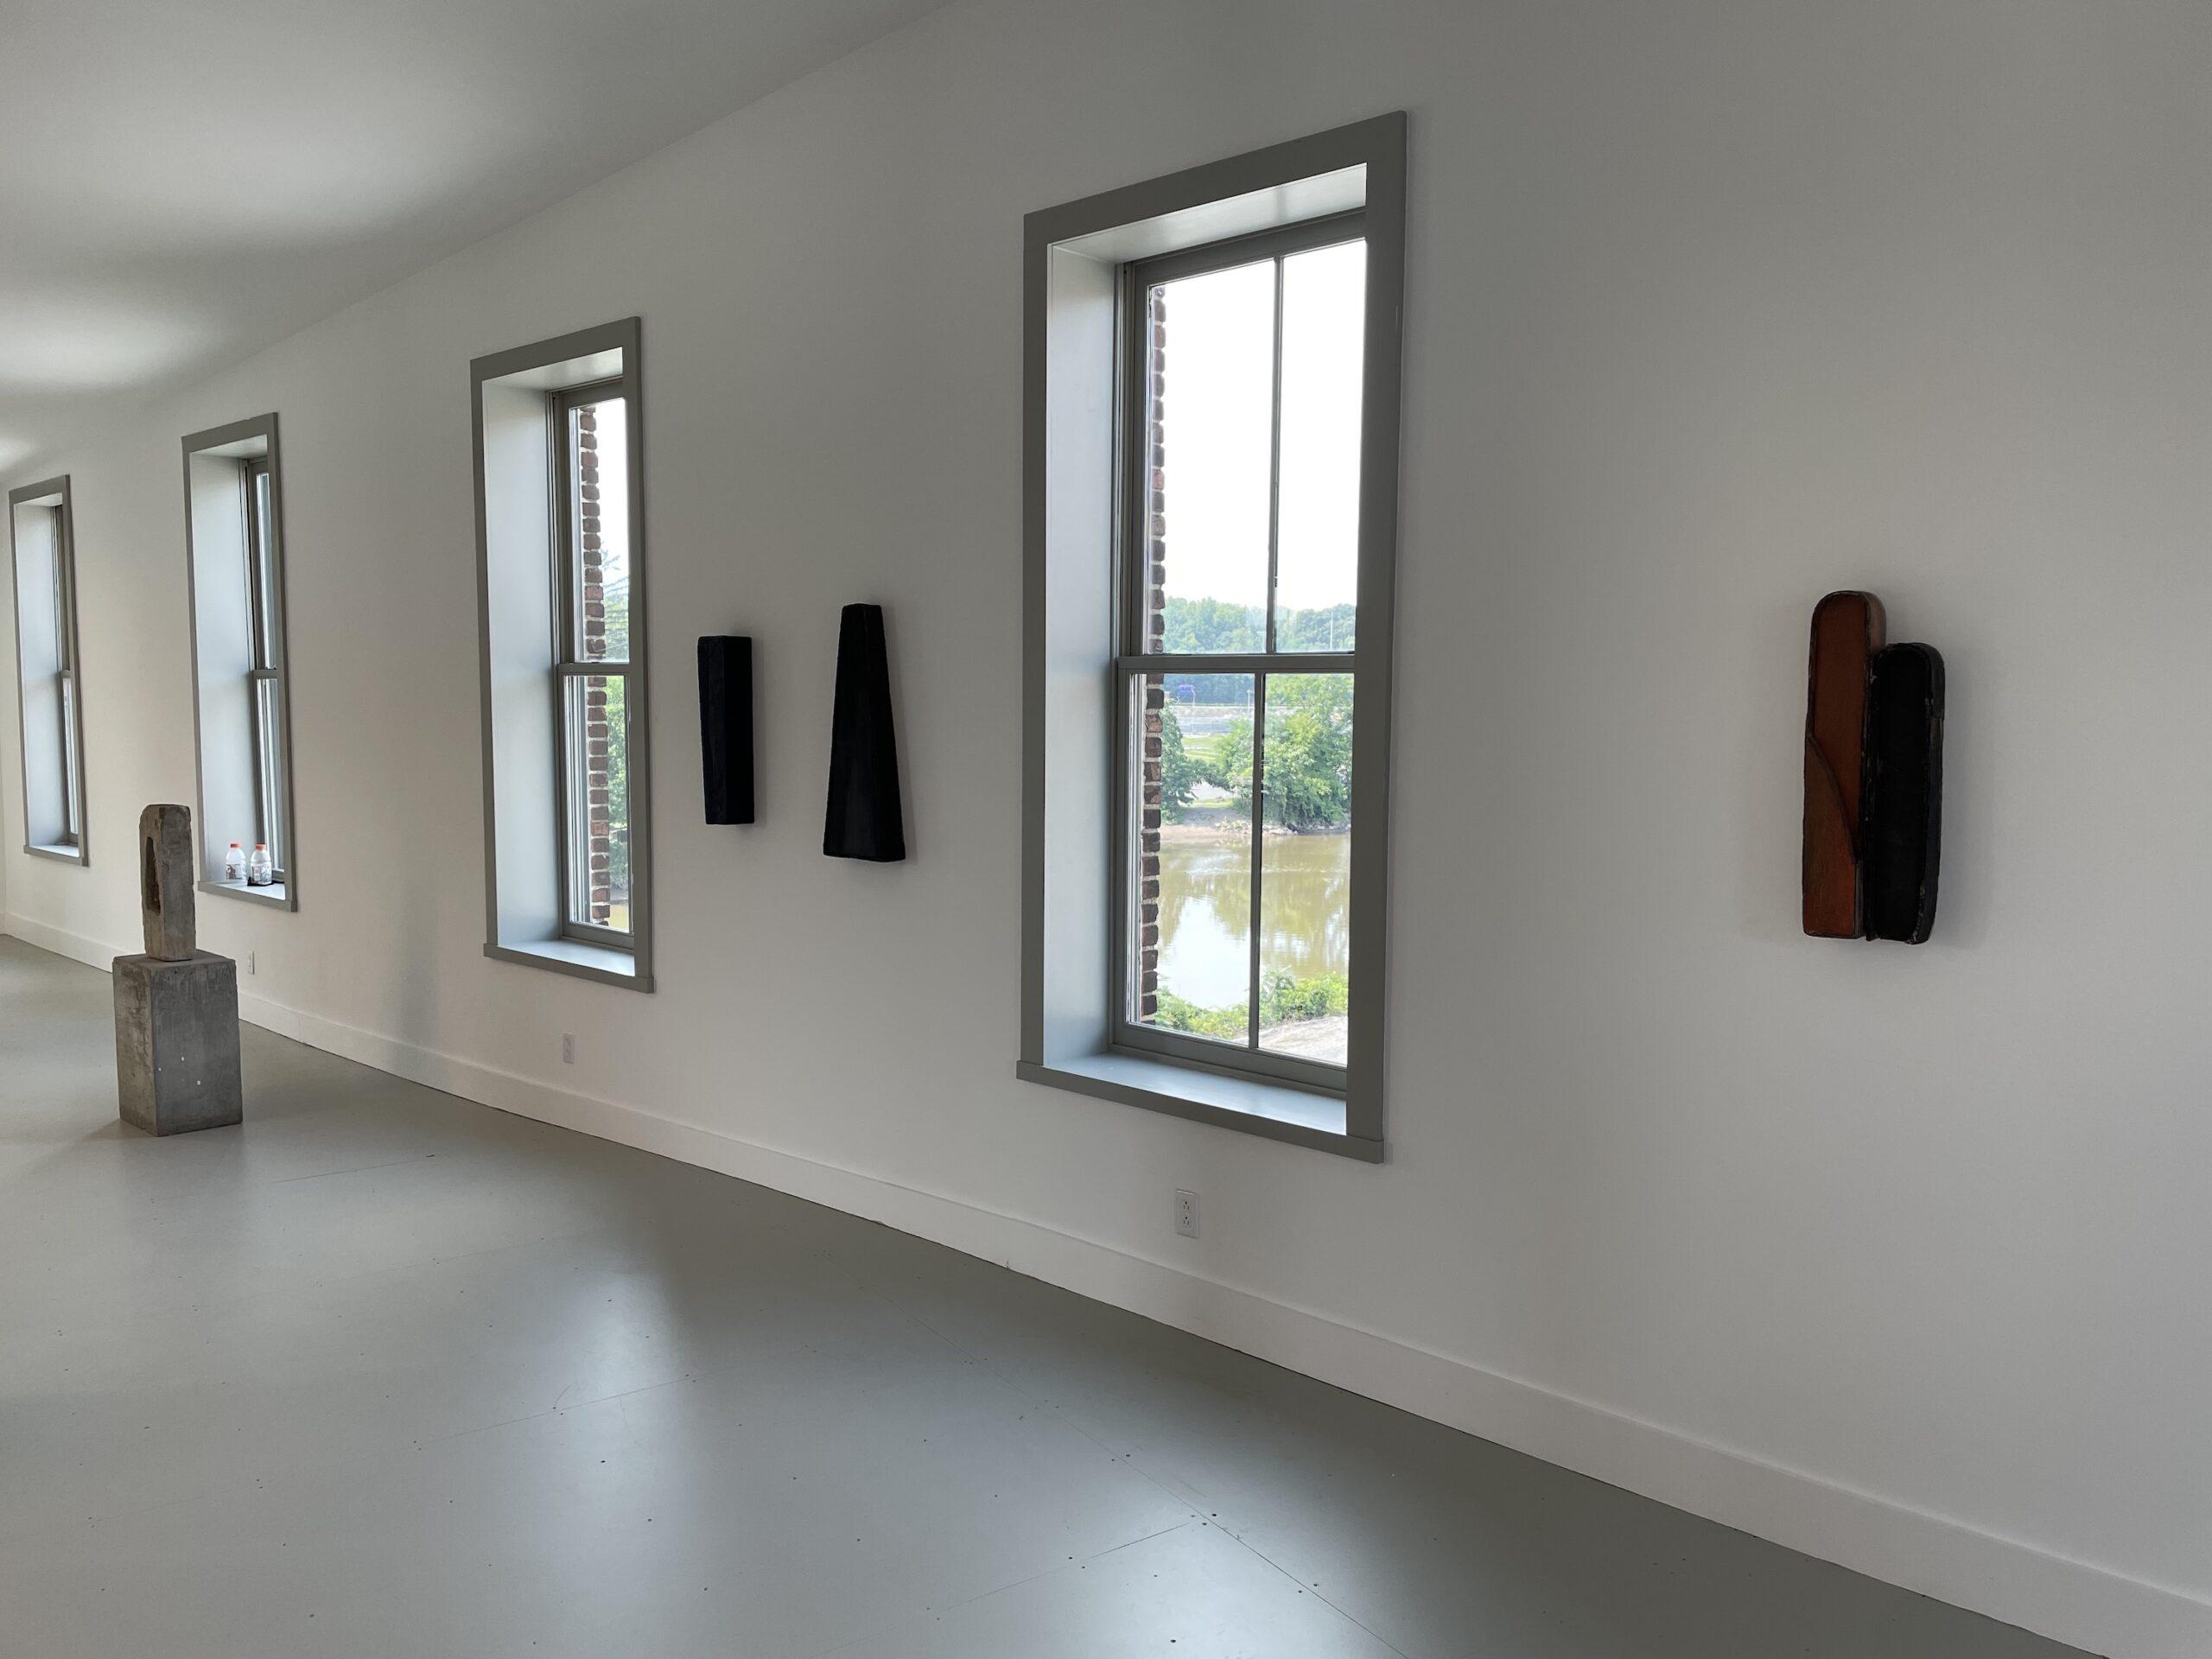 Robert Thiele, NADA x Foreland (Installation view), 2021